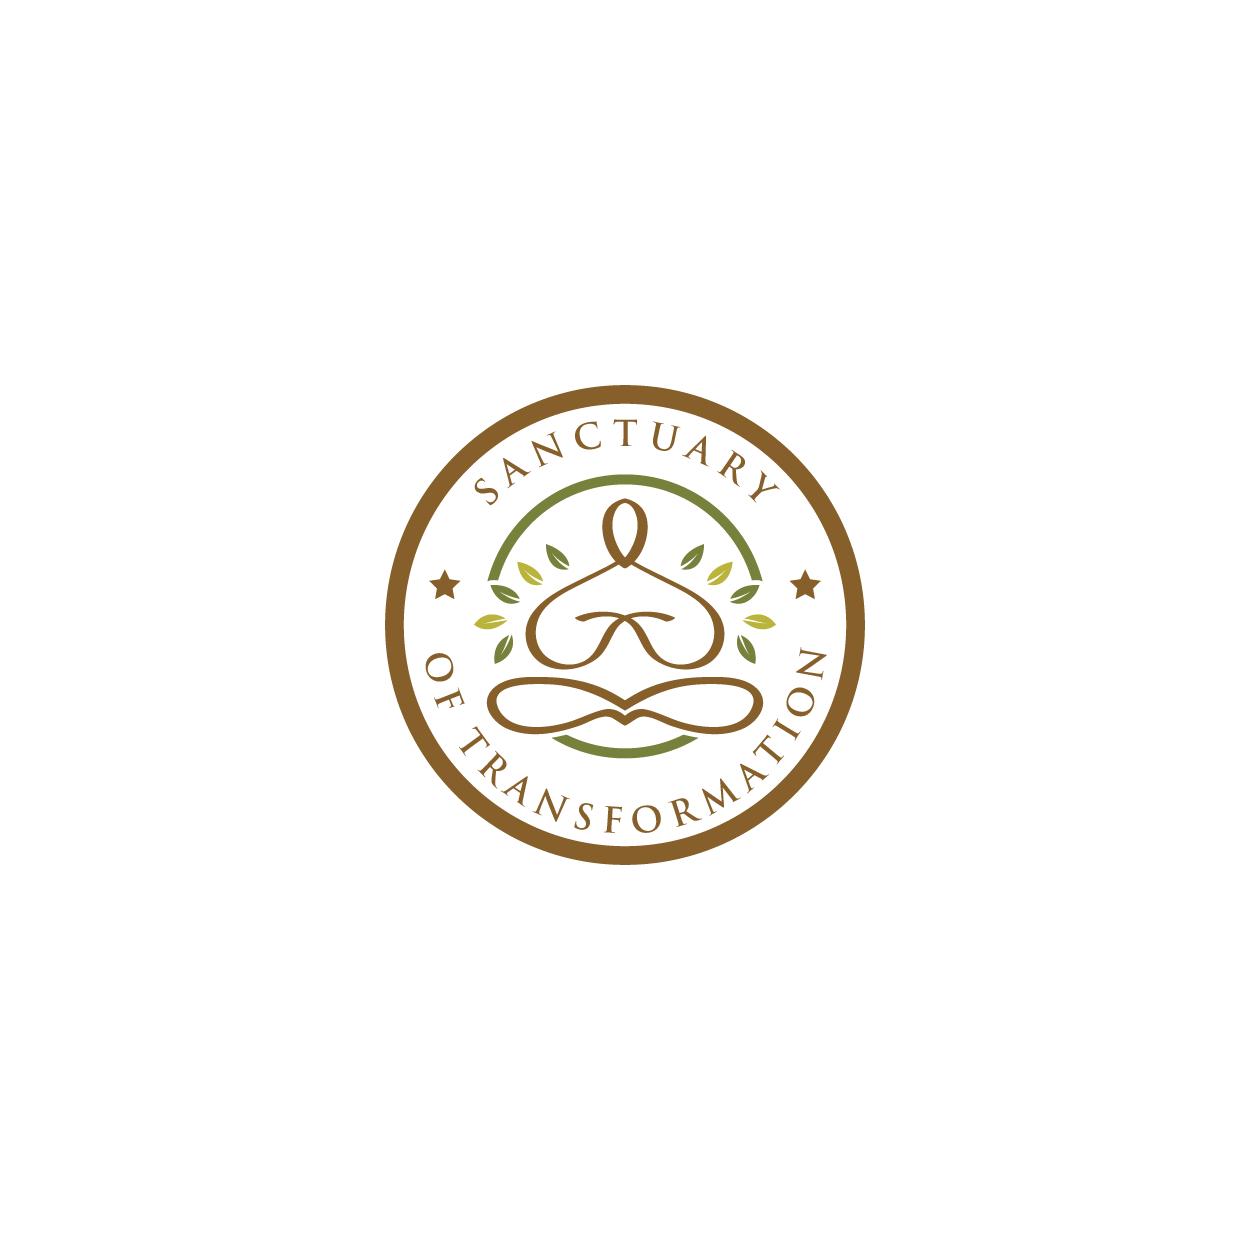 Logo Design by 354studio - Entry No. 41 in the Logo Design Contest Fun Logo Design for Sanctuary of Transformation.